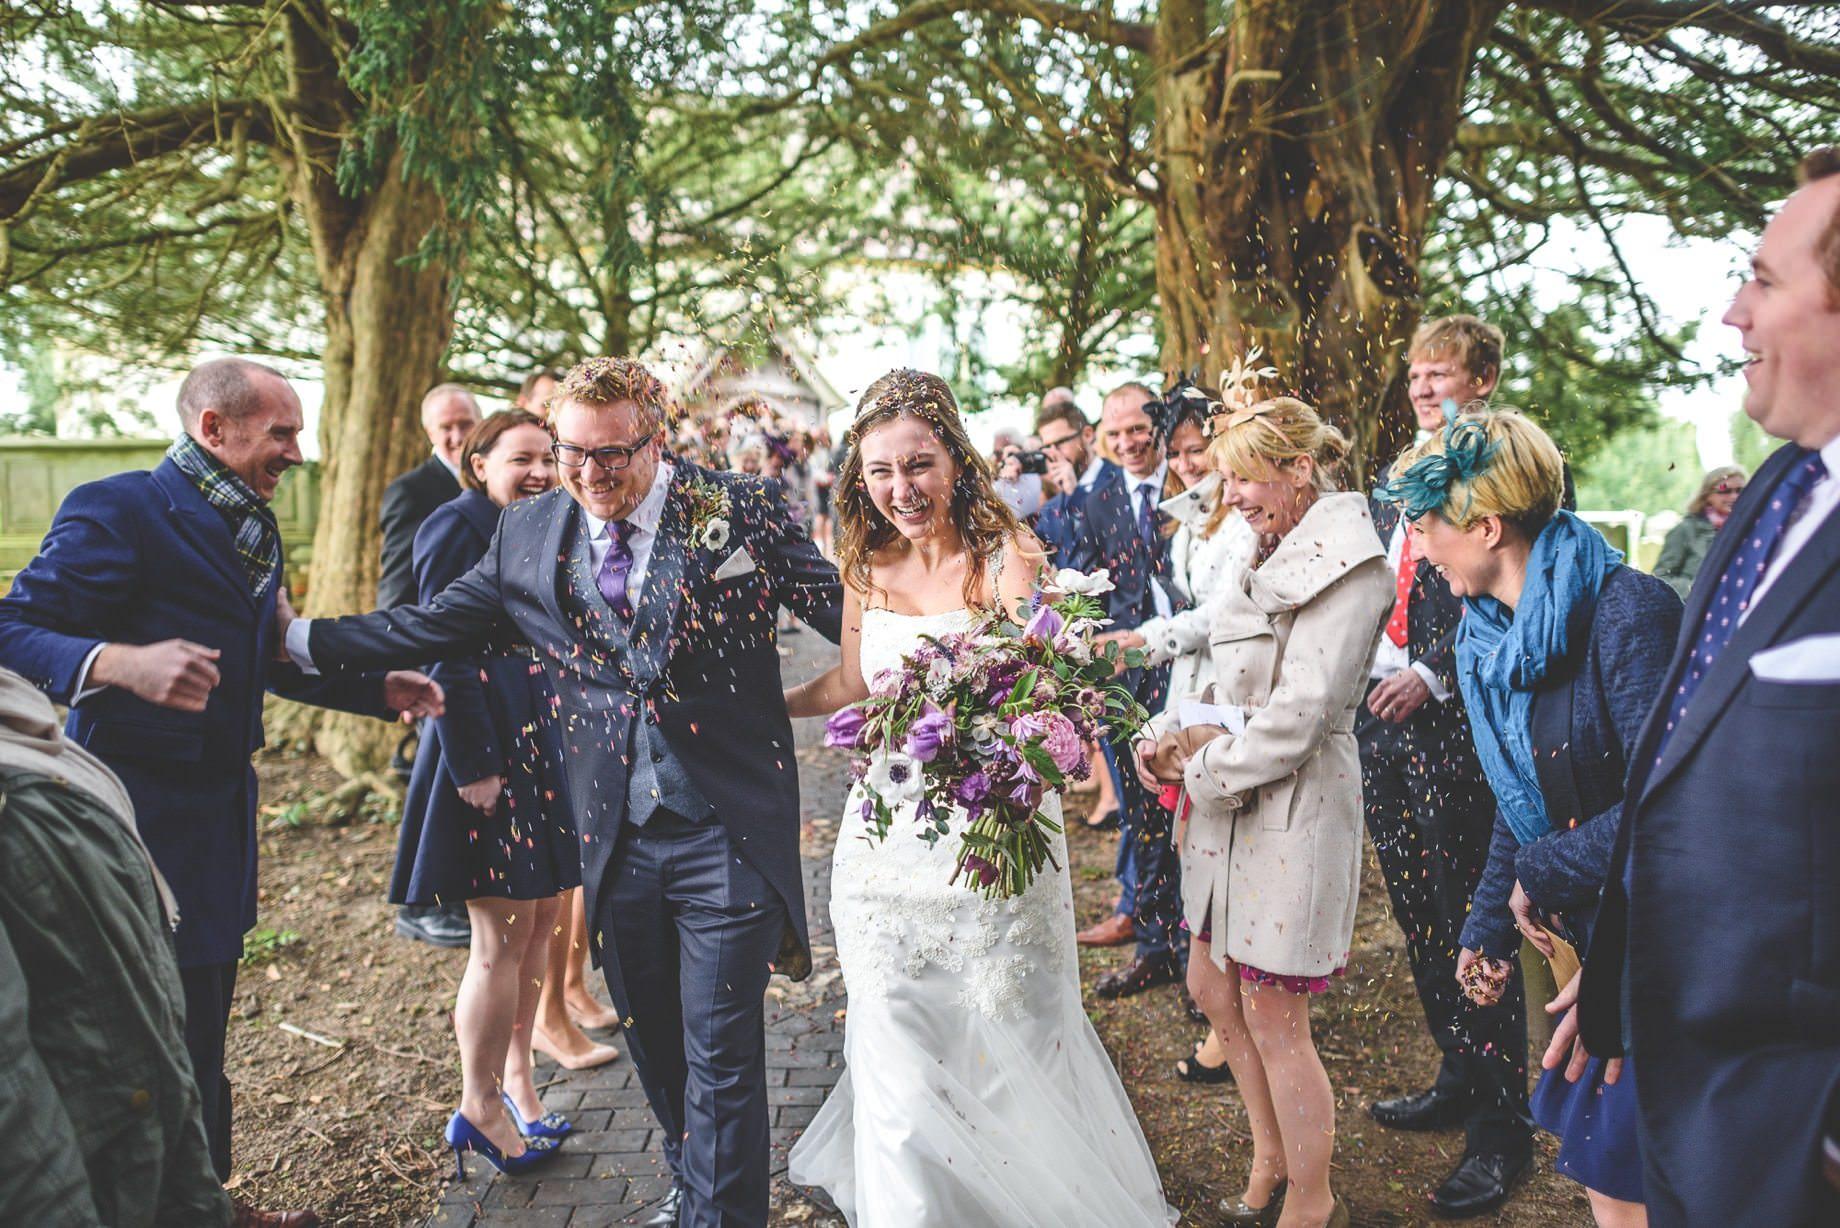 Heather-and-Chris-Hampshire-wedding-photography-90-of-174